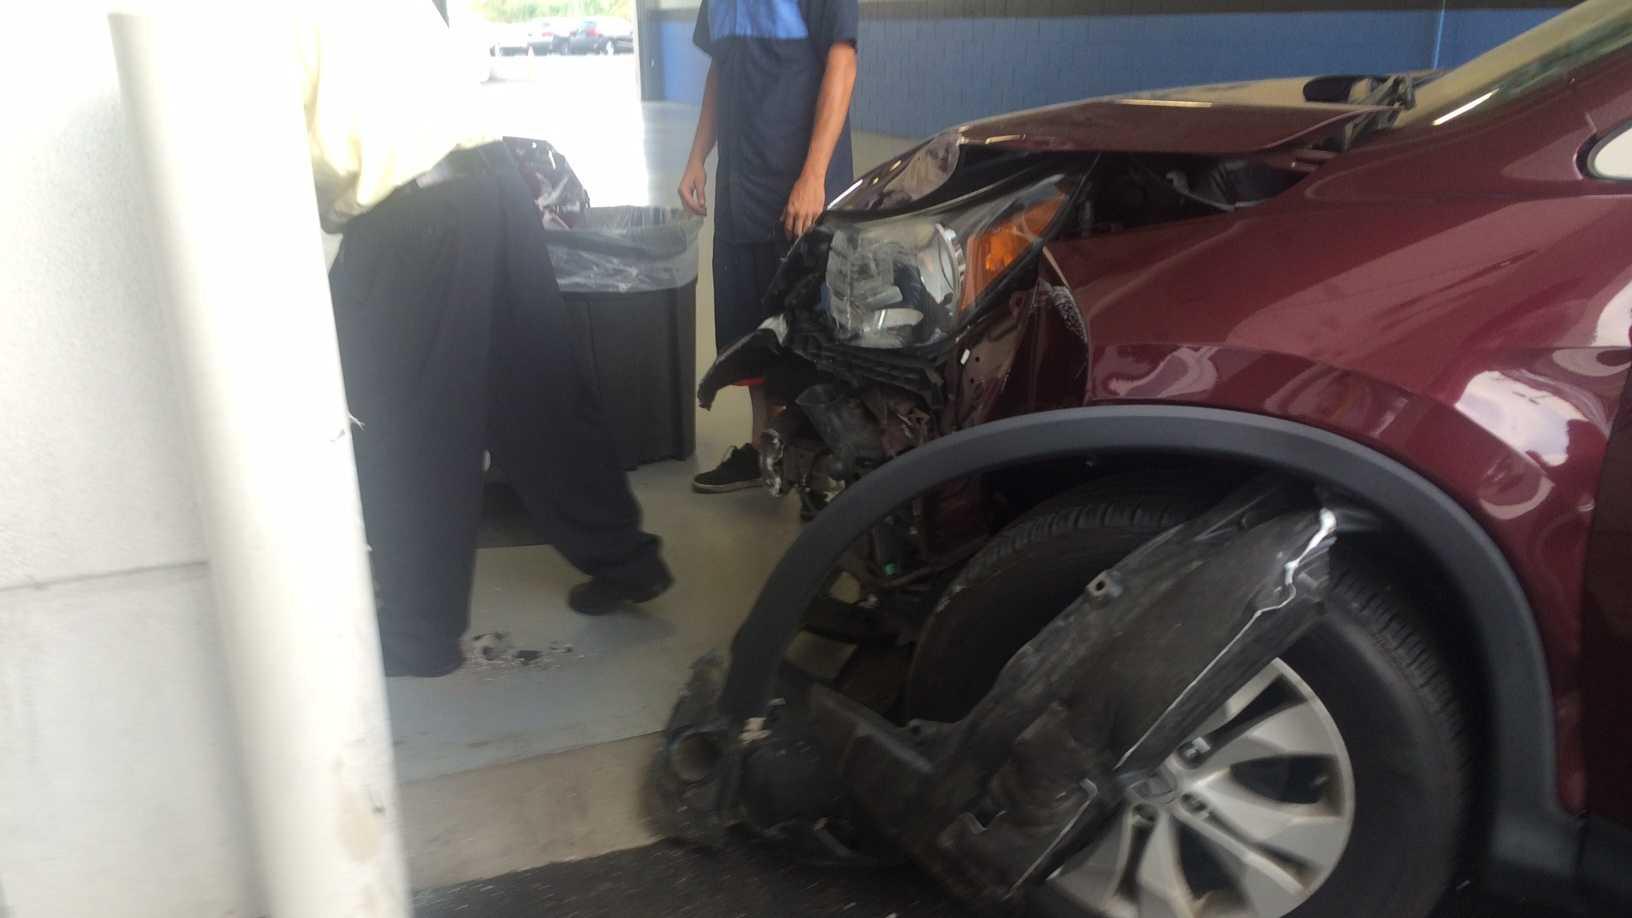 Monroeville car into service drive